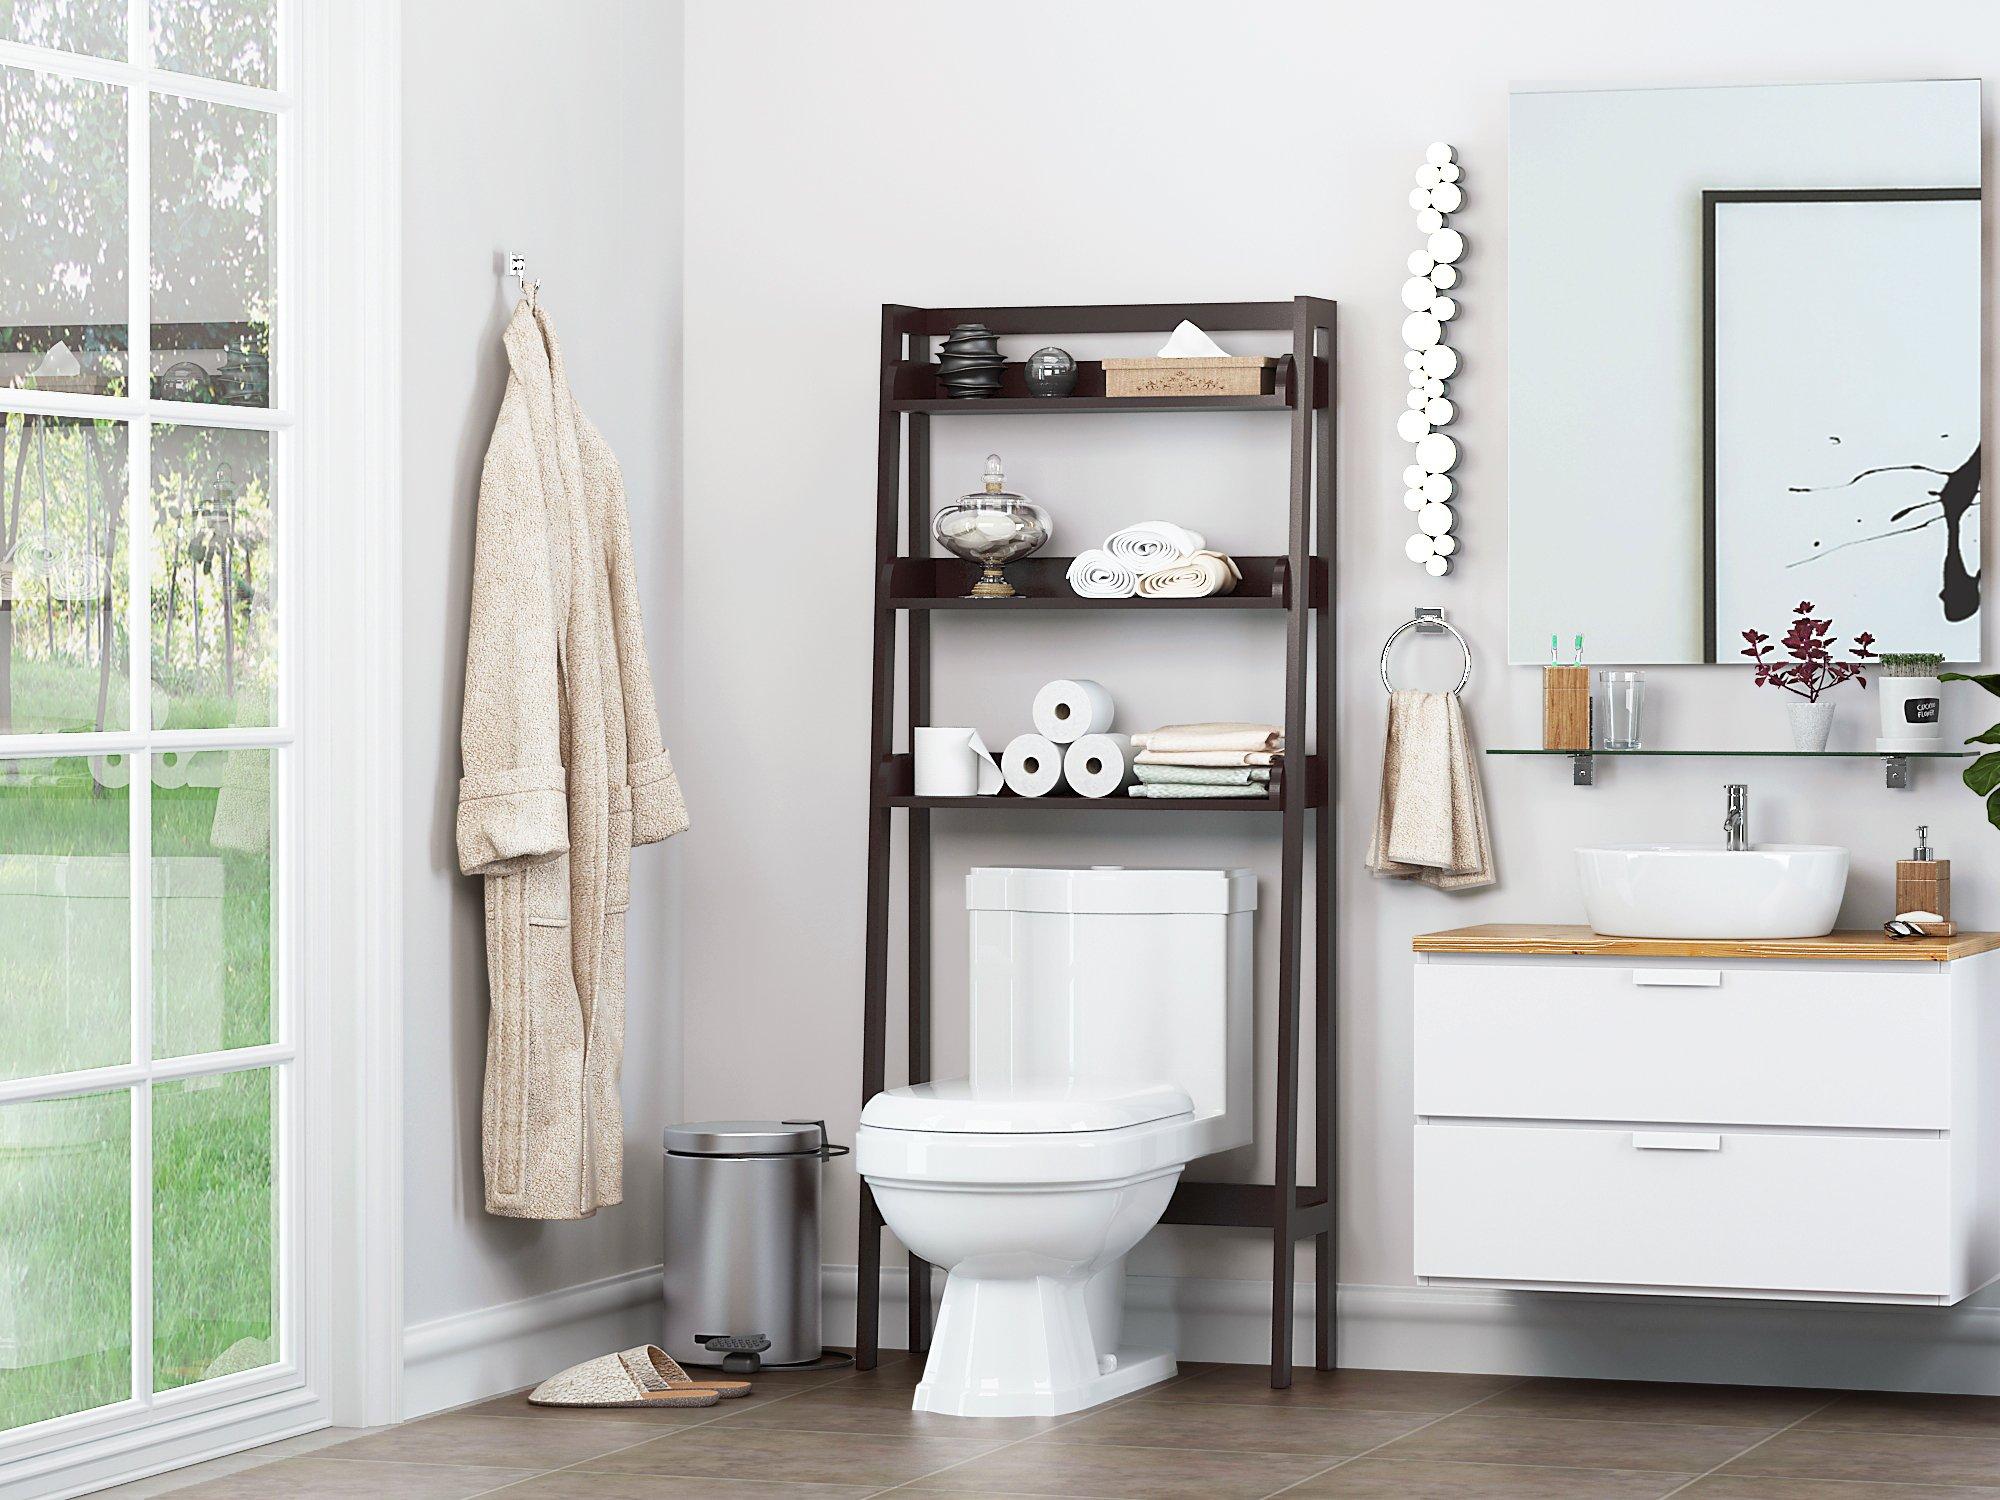 UTEX 3-Shelf Bathroom Organizer Over The Toilet, Bathroom ...